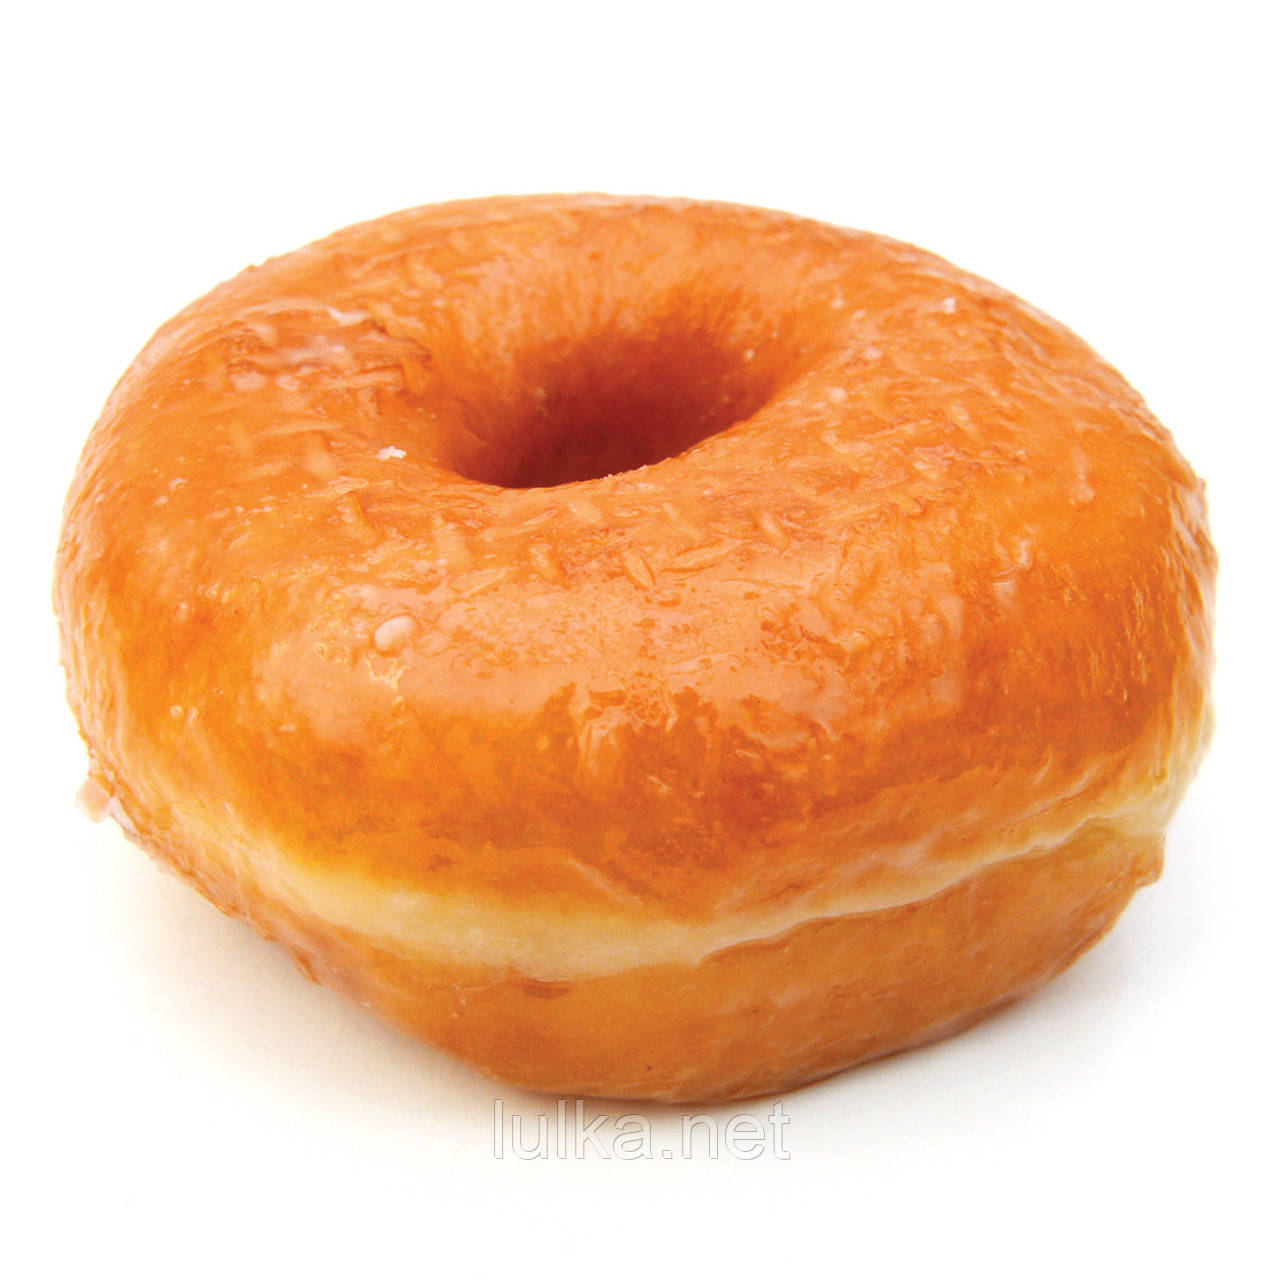 Ароматизатор TPA Frosted Donut (Пончик с глазурью) 5мл.